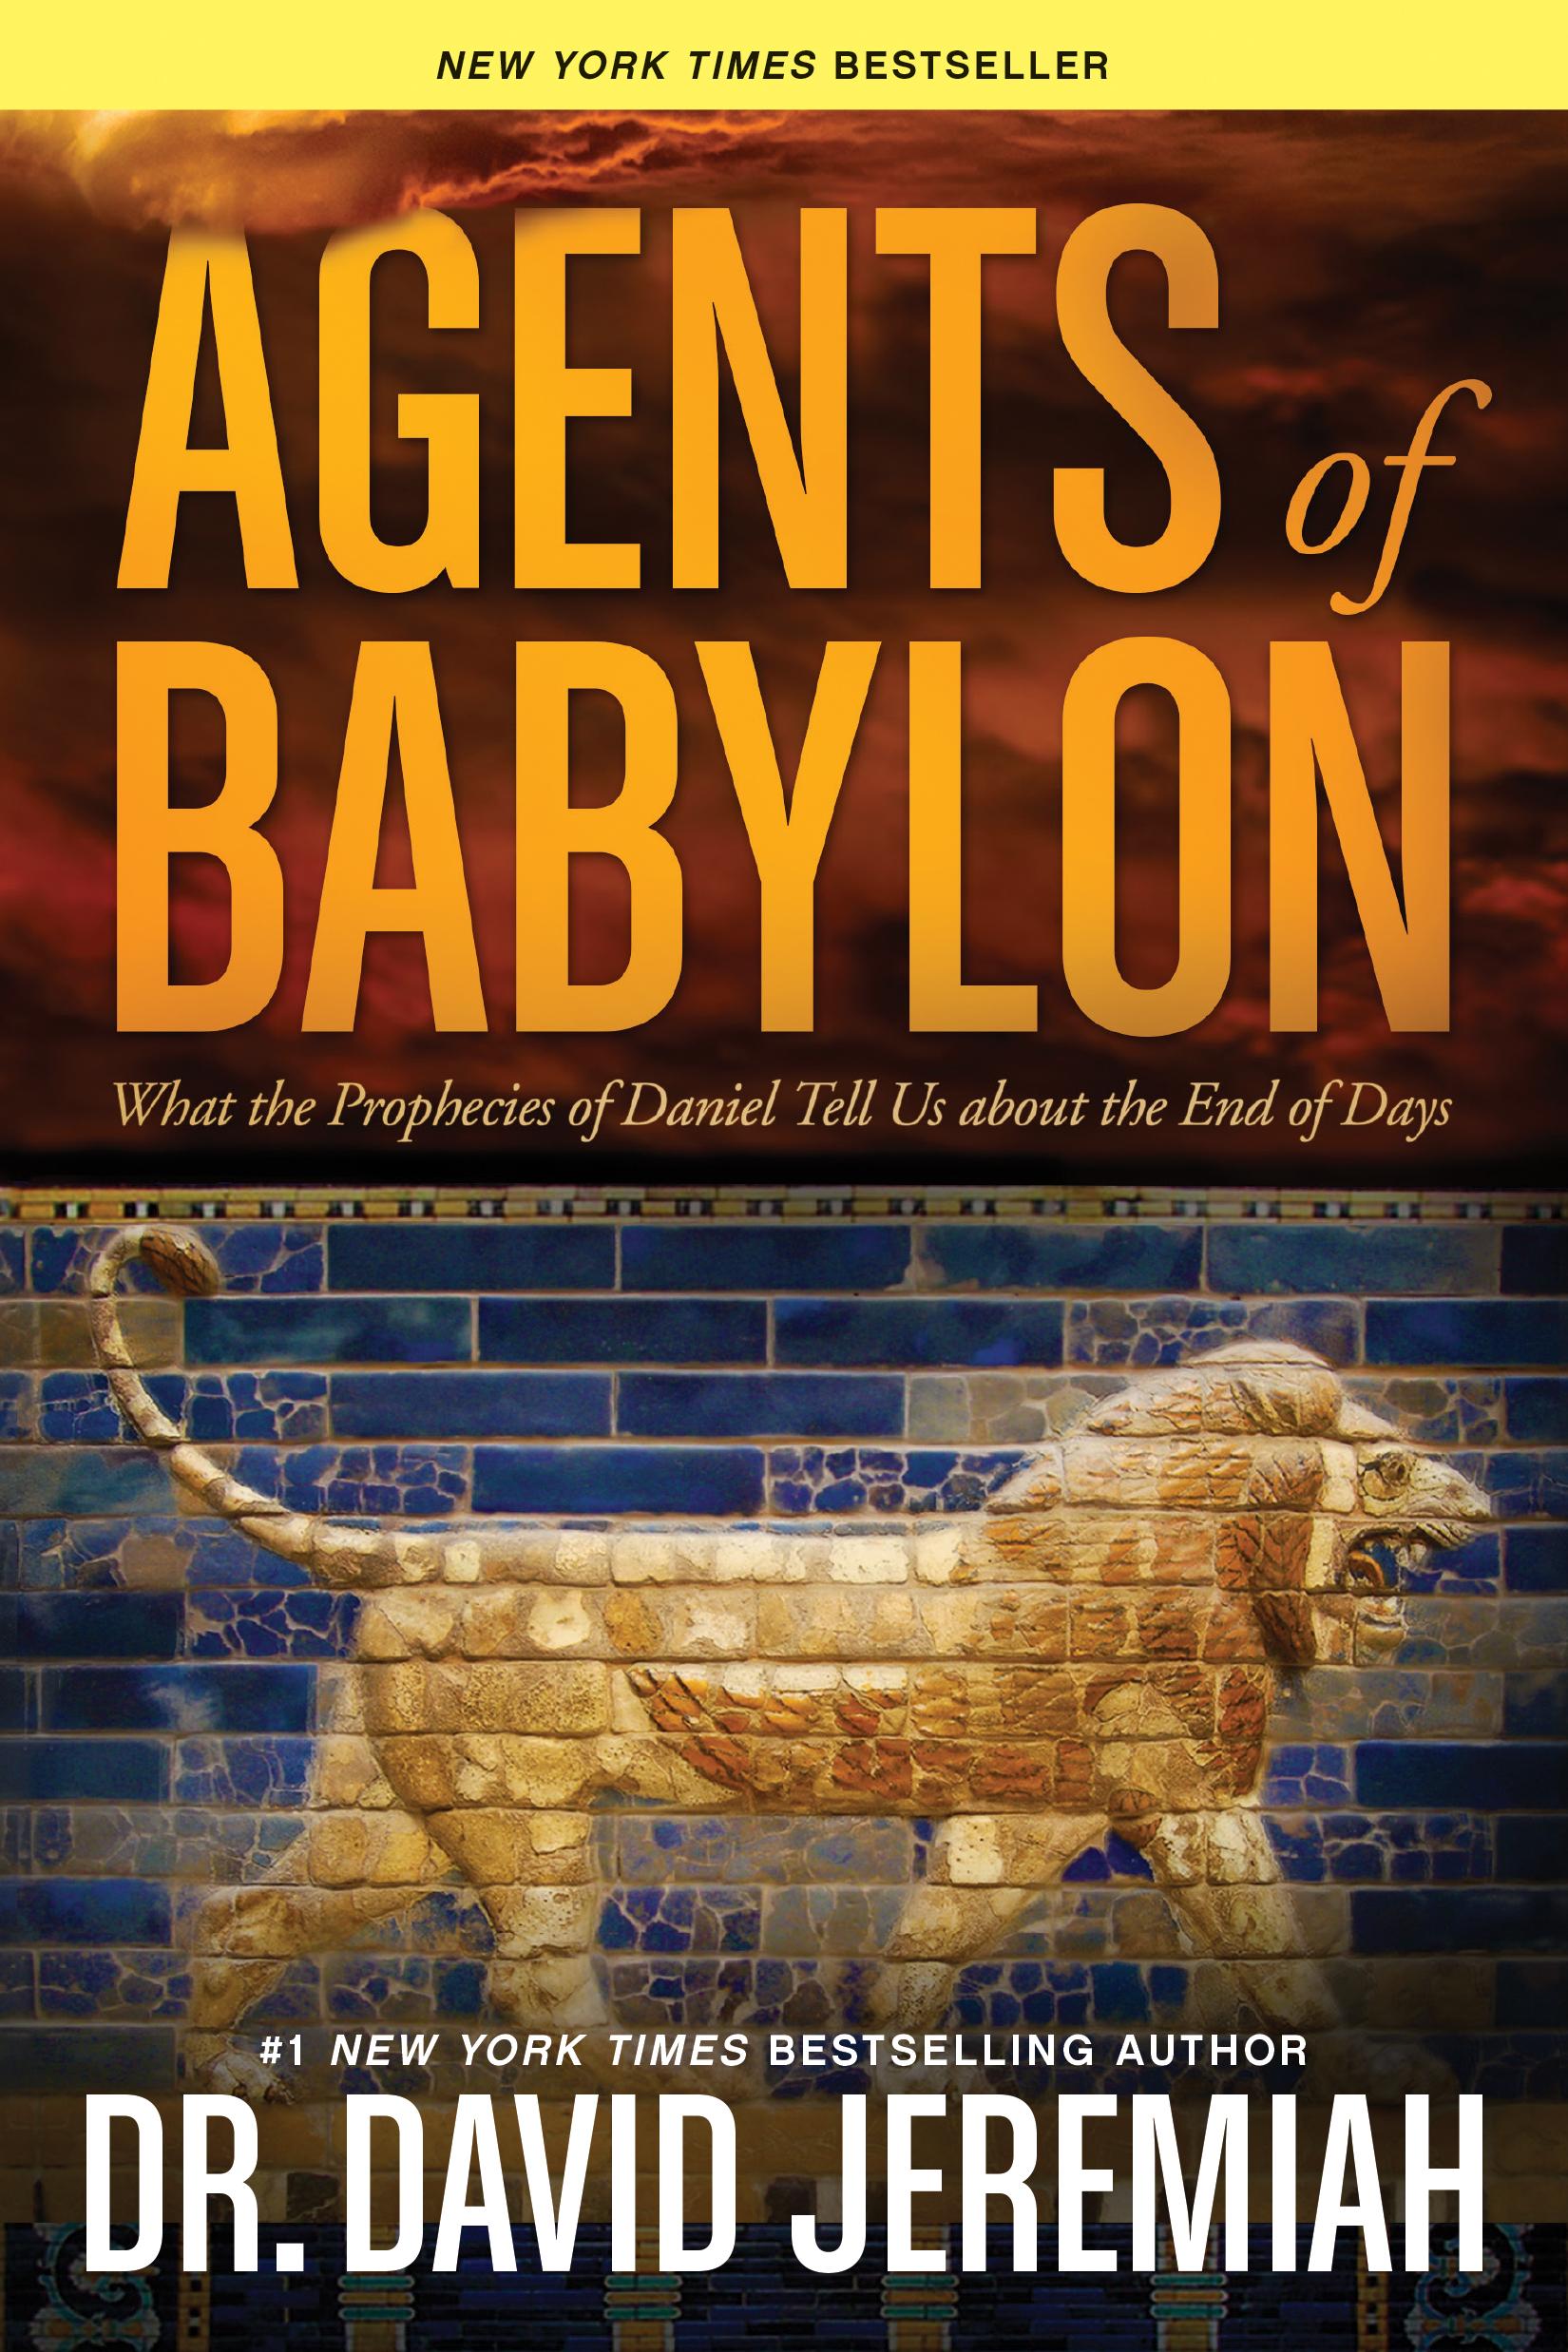 Agents of Babylon